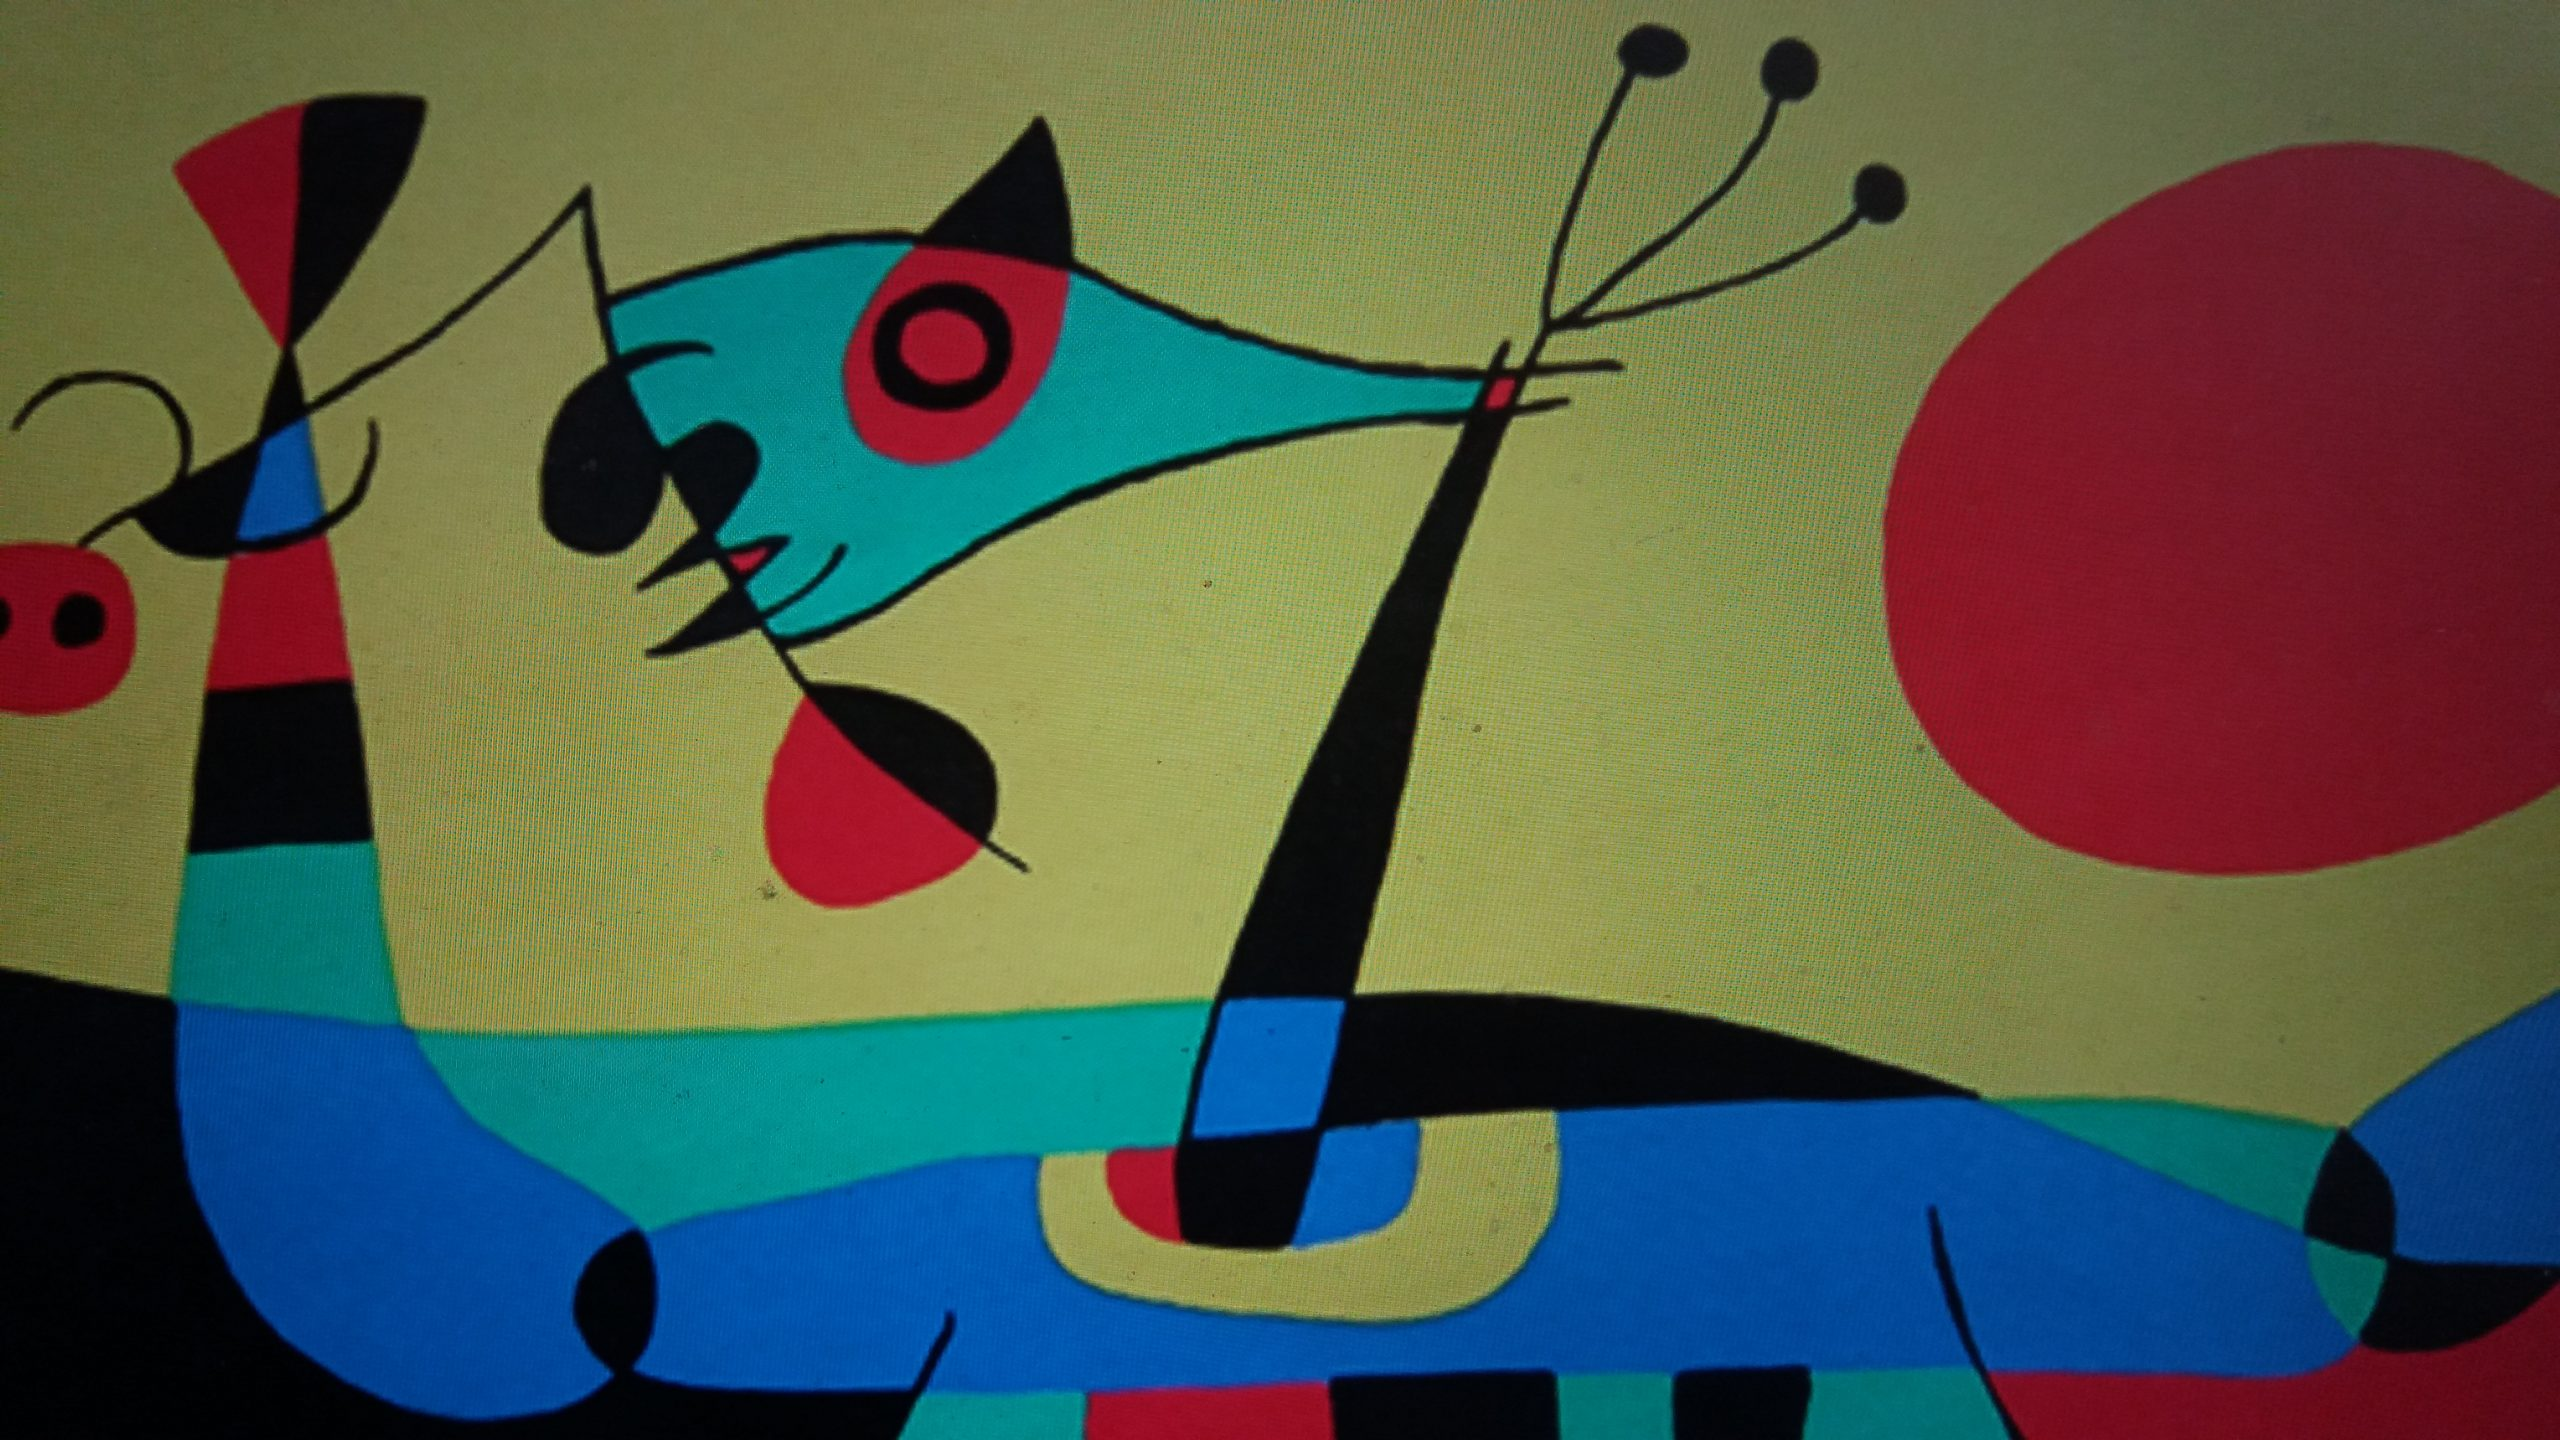 Wer war Joan Miró